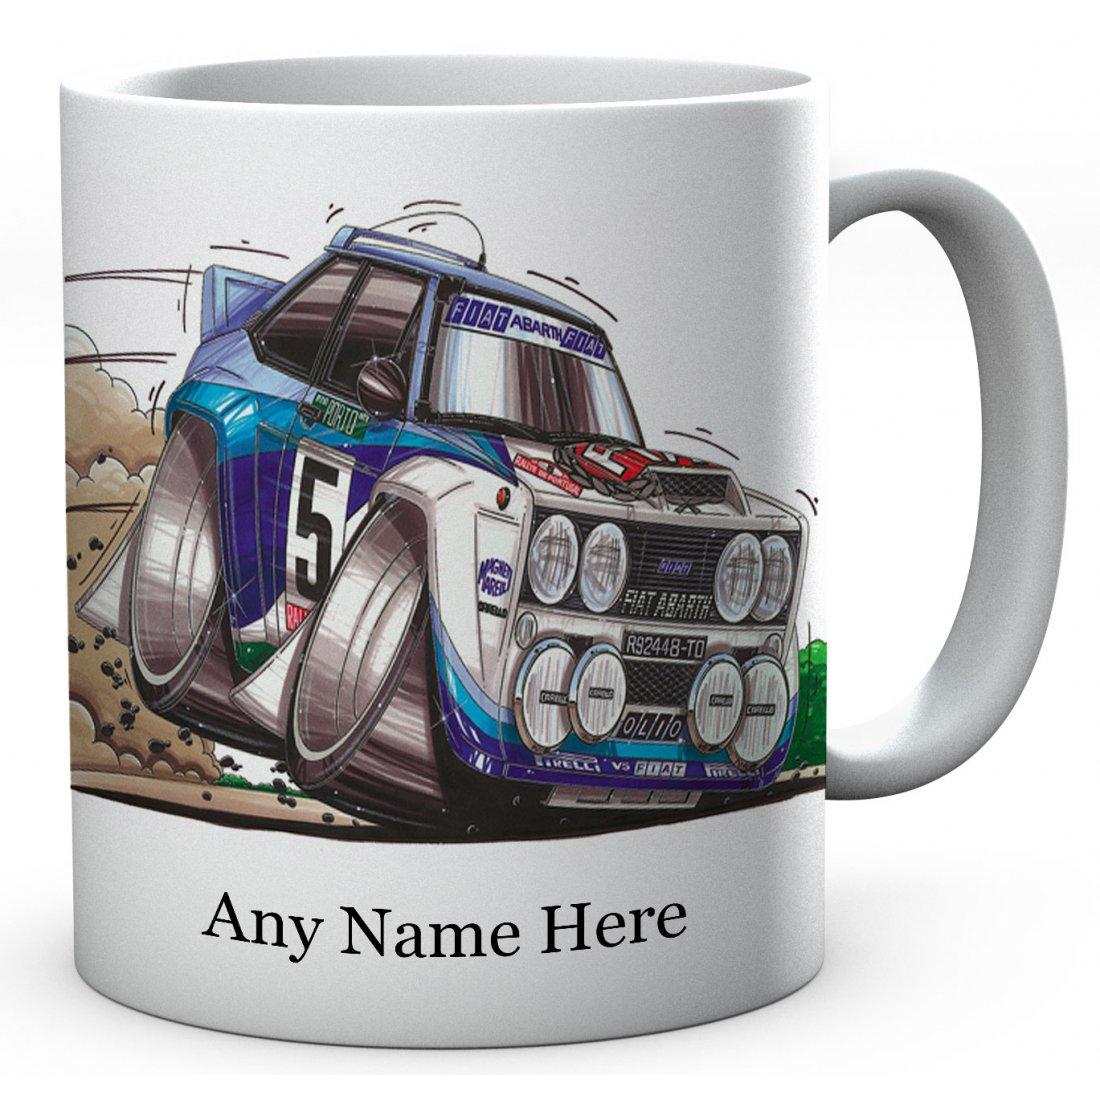 Personalised Koolart 131 ABARTH RALLY BLUE / WHITE Ceramic Mug